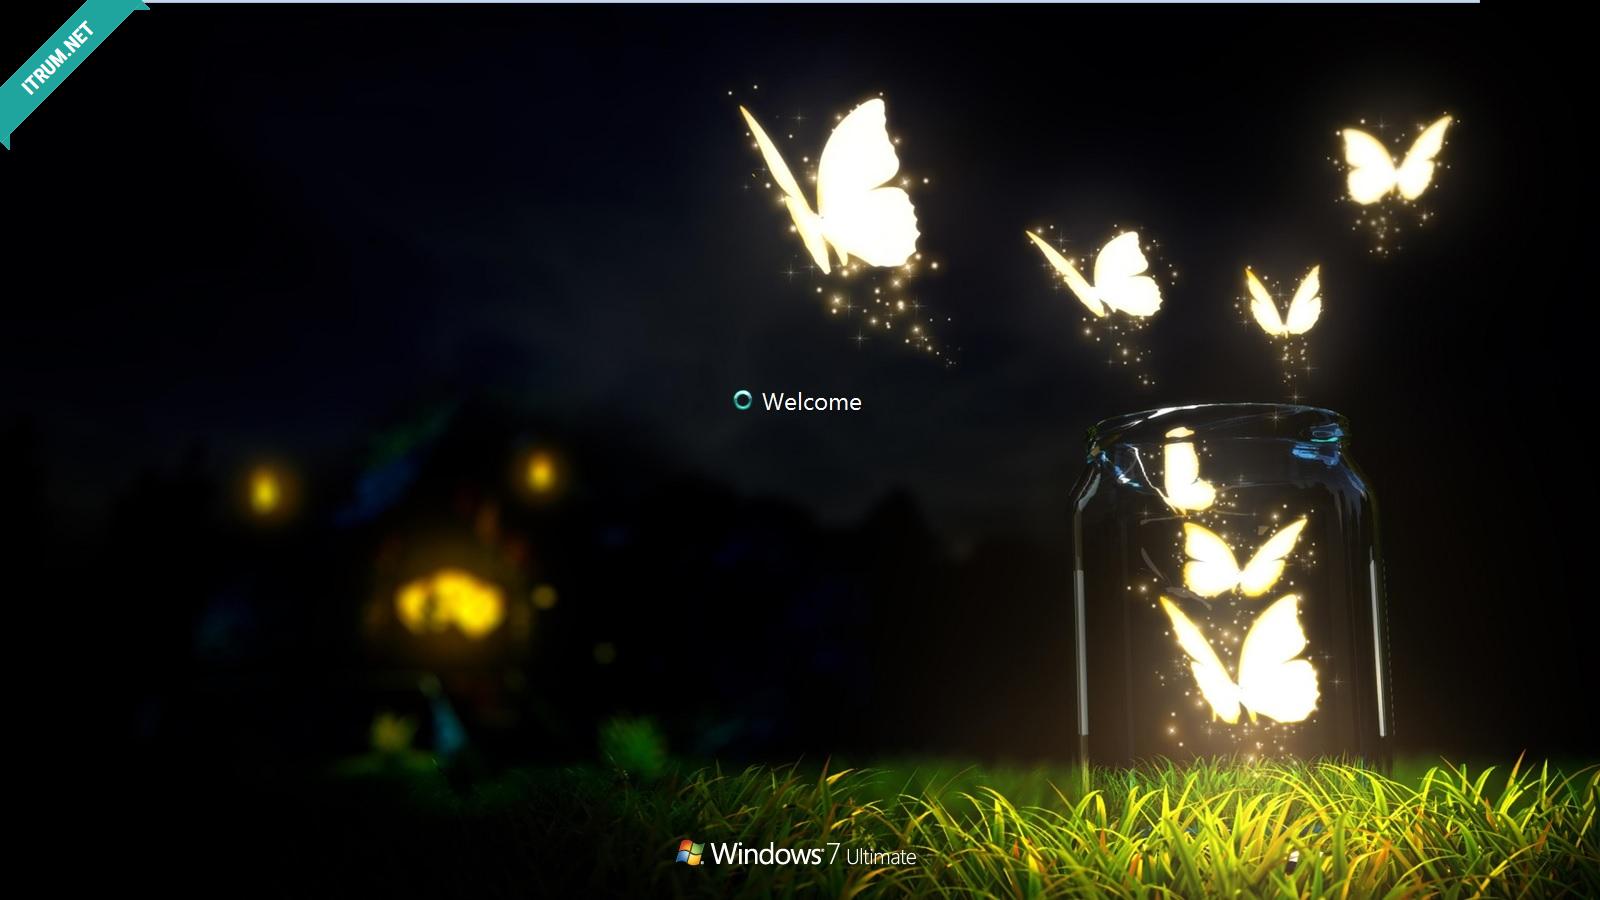 [Windows Install & Ghost] - Windows 7 Spring - Chào năm mới 2017